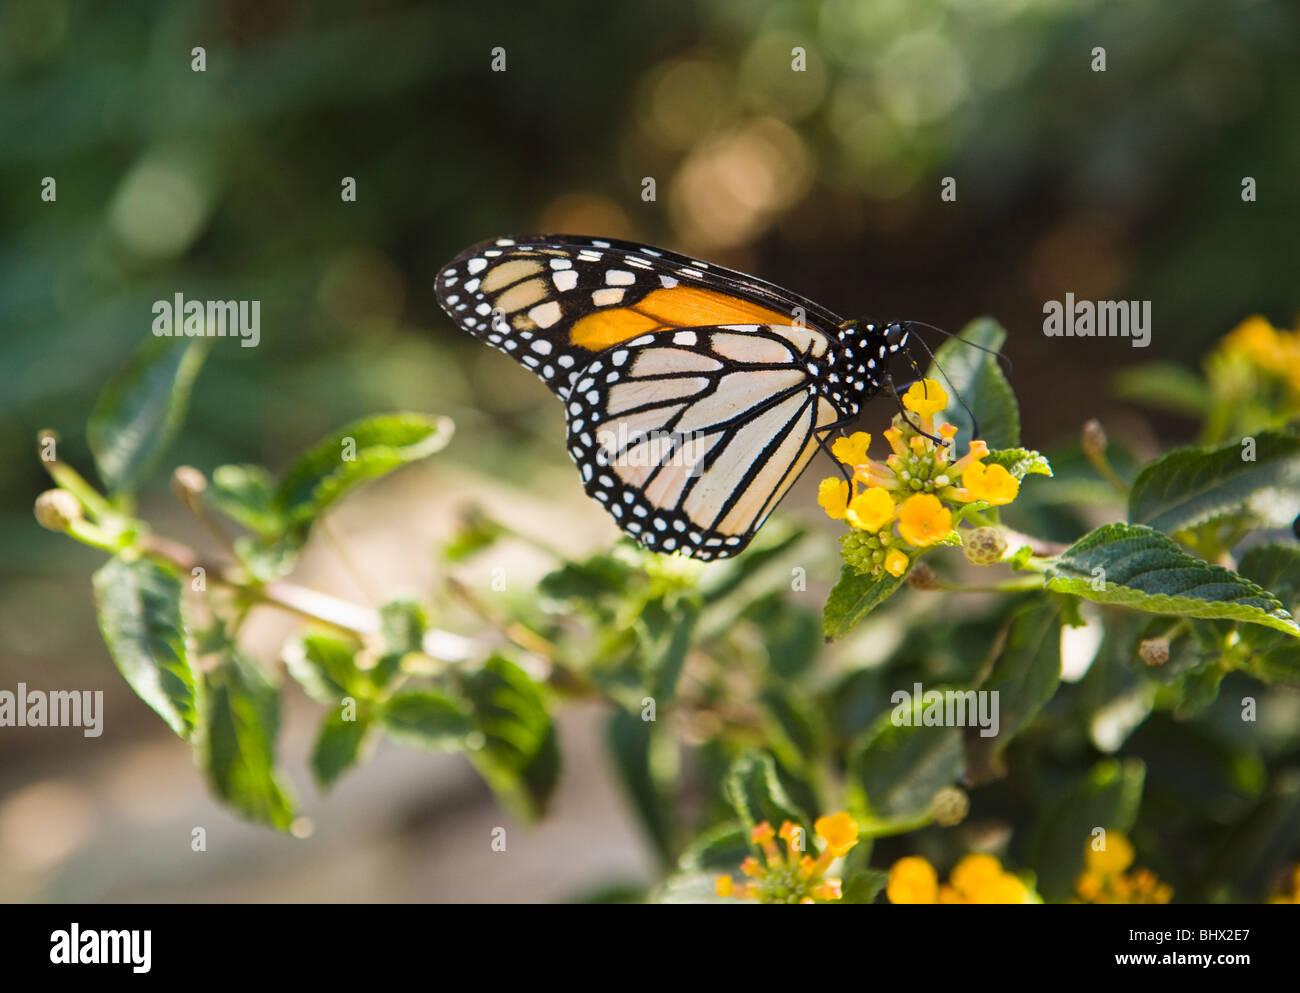 A Monarch Butterfly feeding from flowers, Phoenix, Arizona, USA. - Stock Image